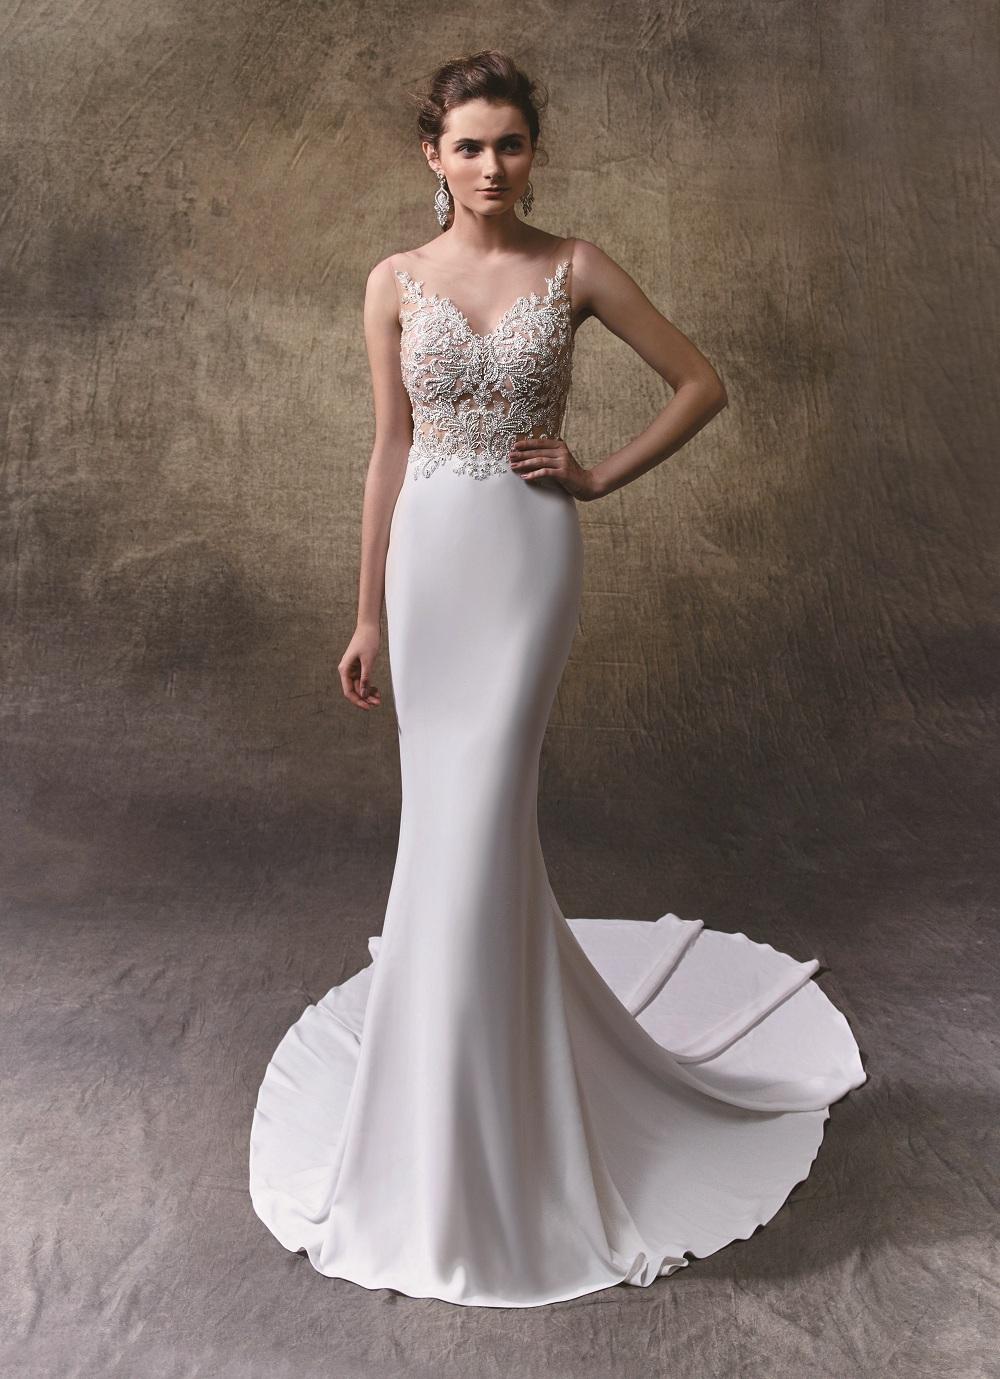 suknia: Enzoani